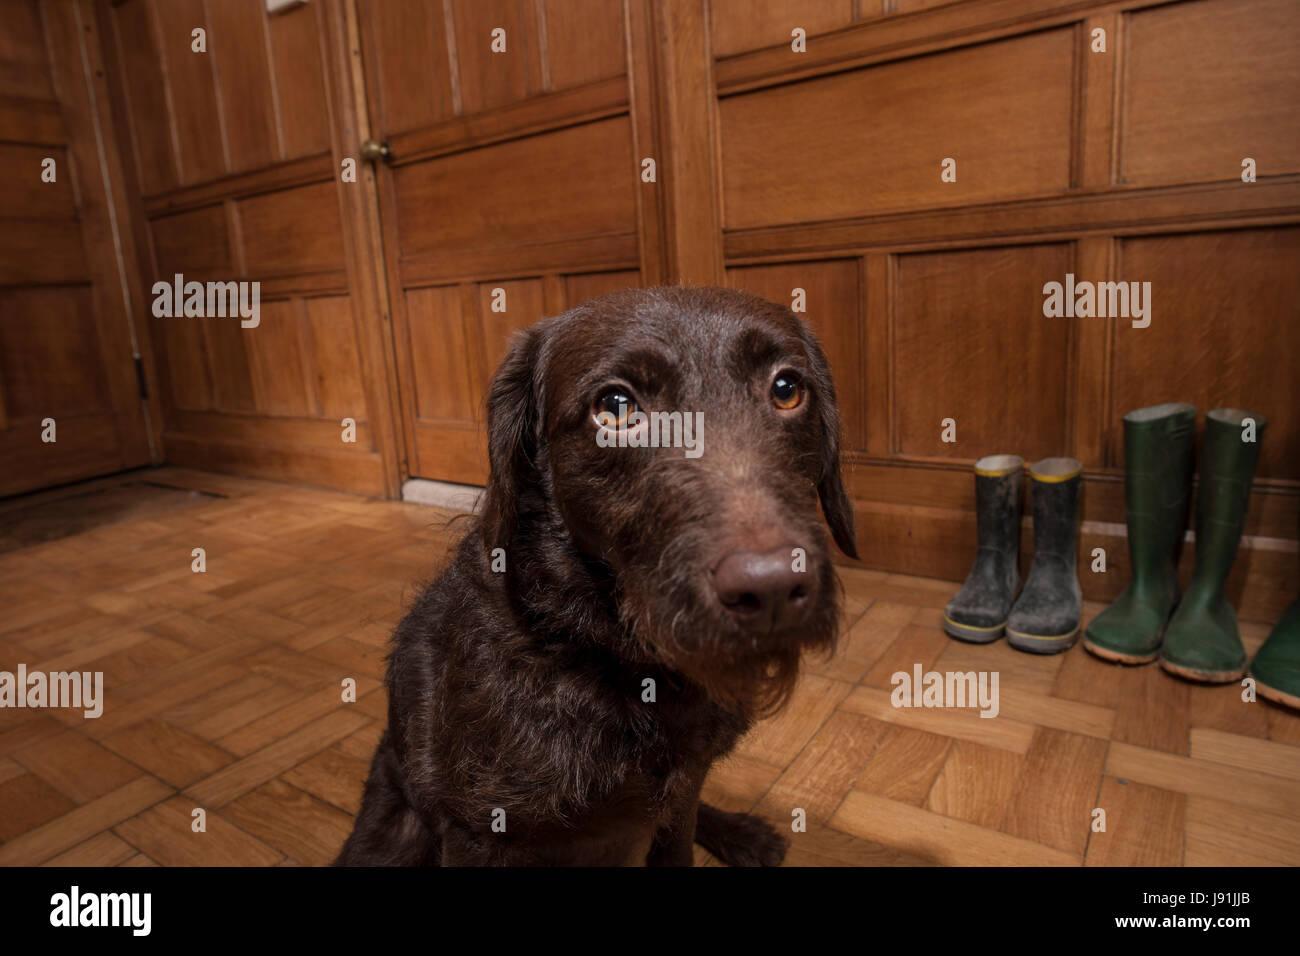 Hund im Flur warten Stockbild